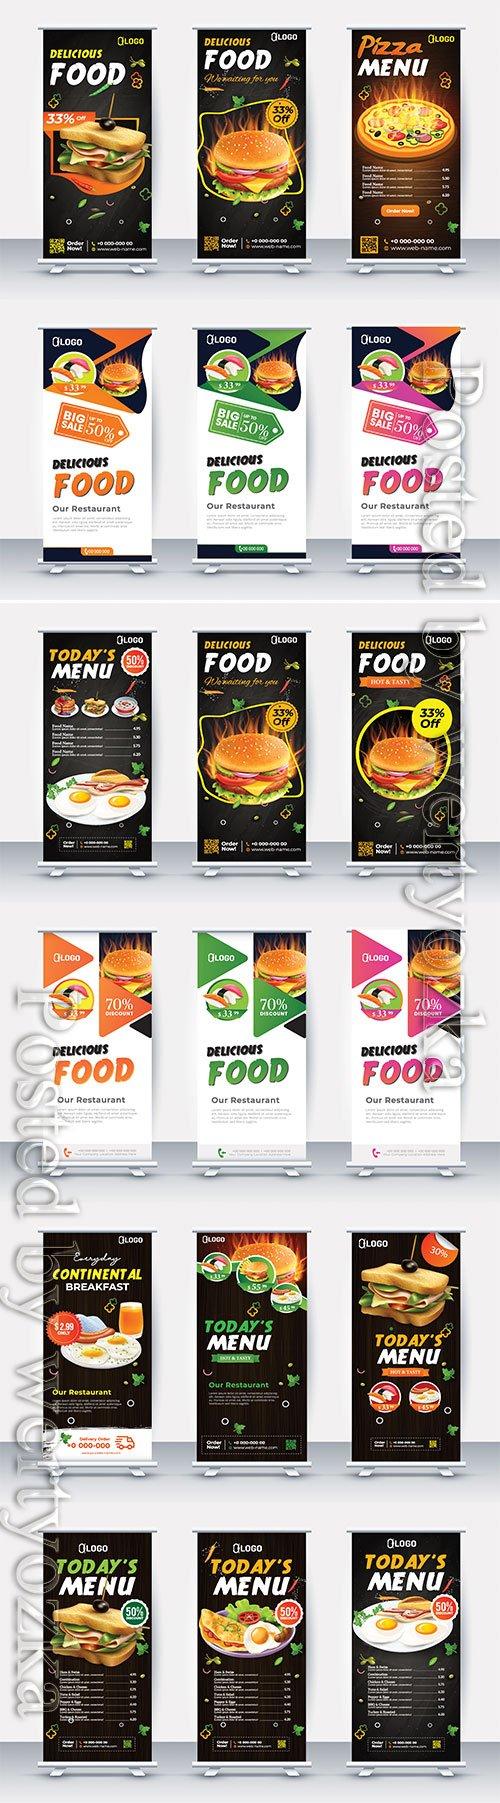 Fast food roll up banner, vector restaurant menu template